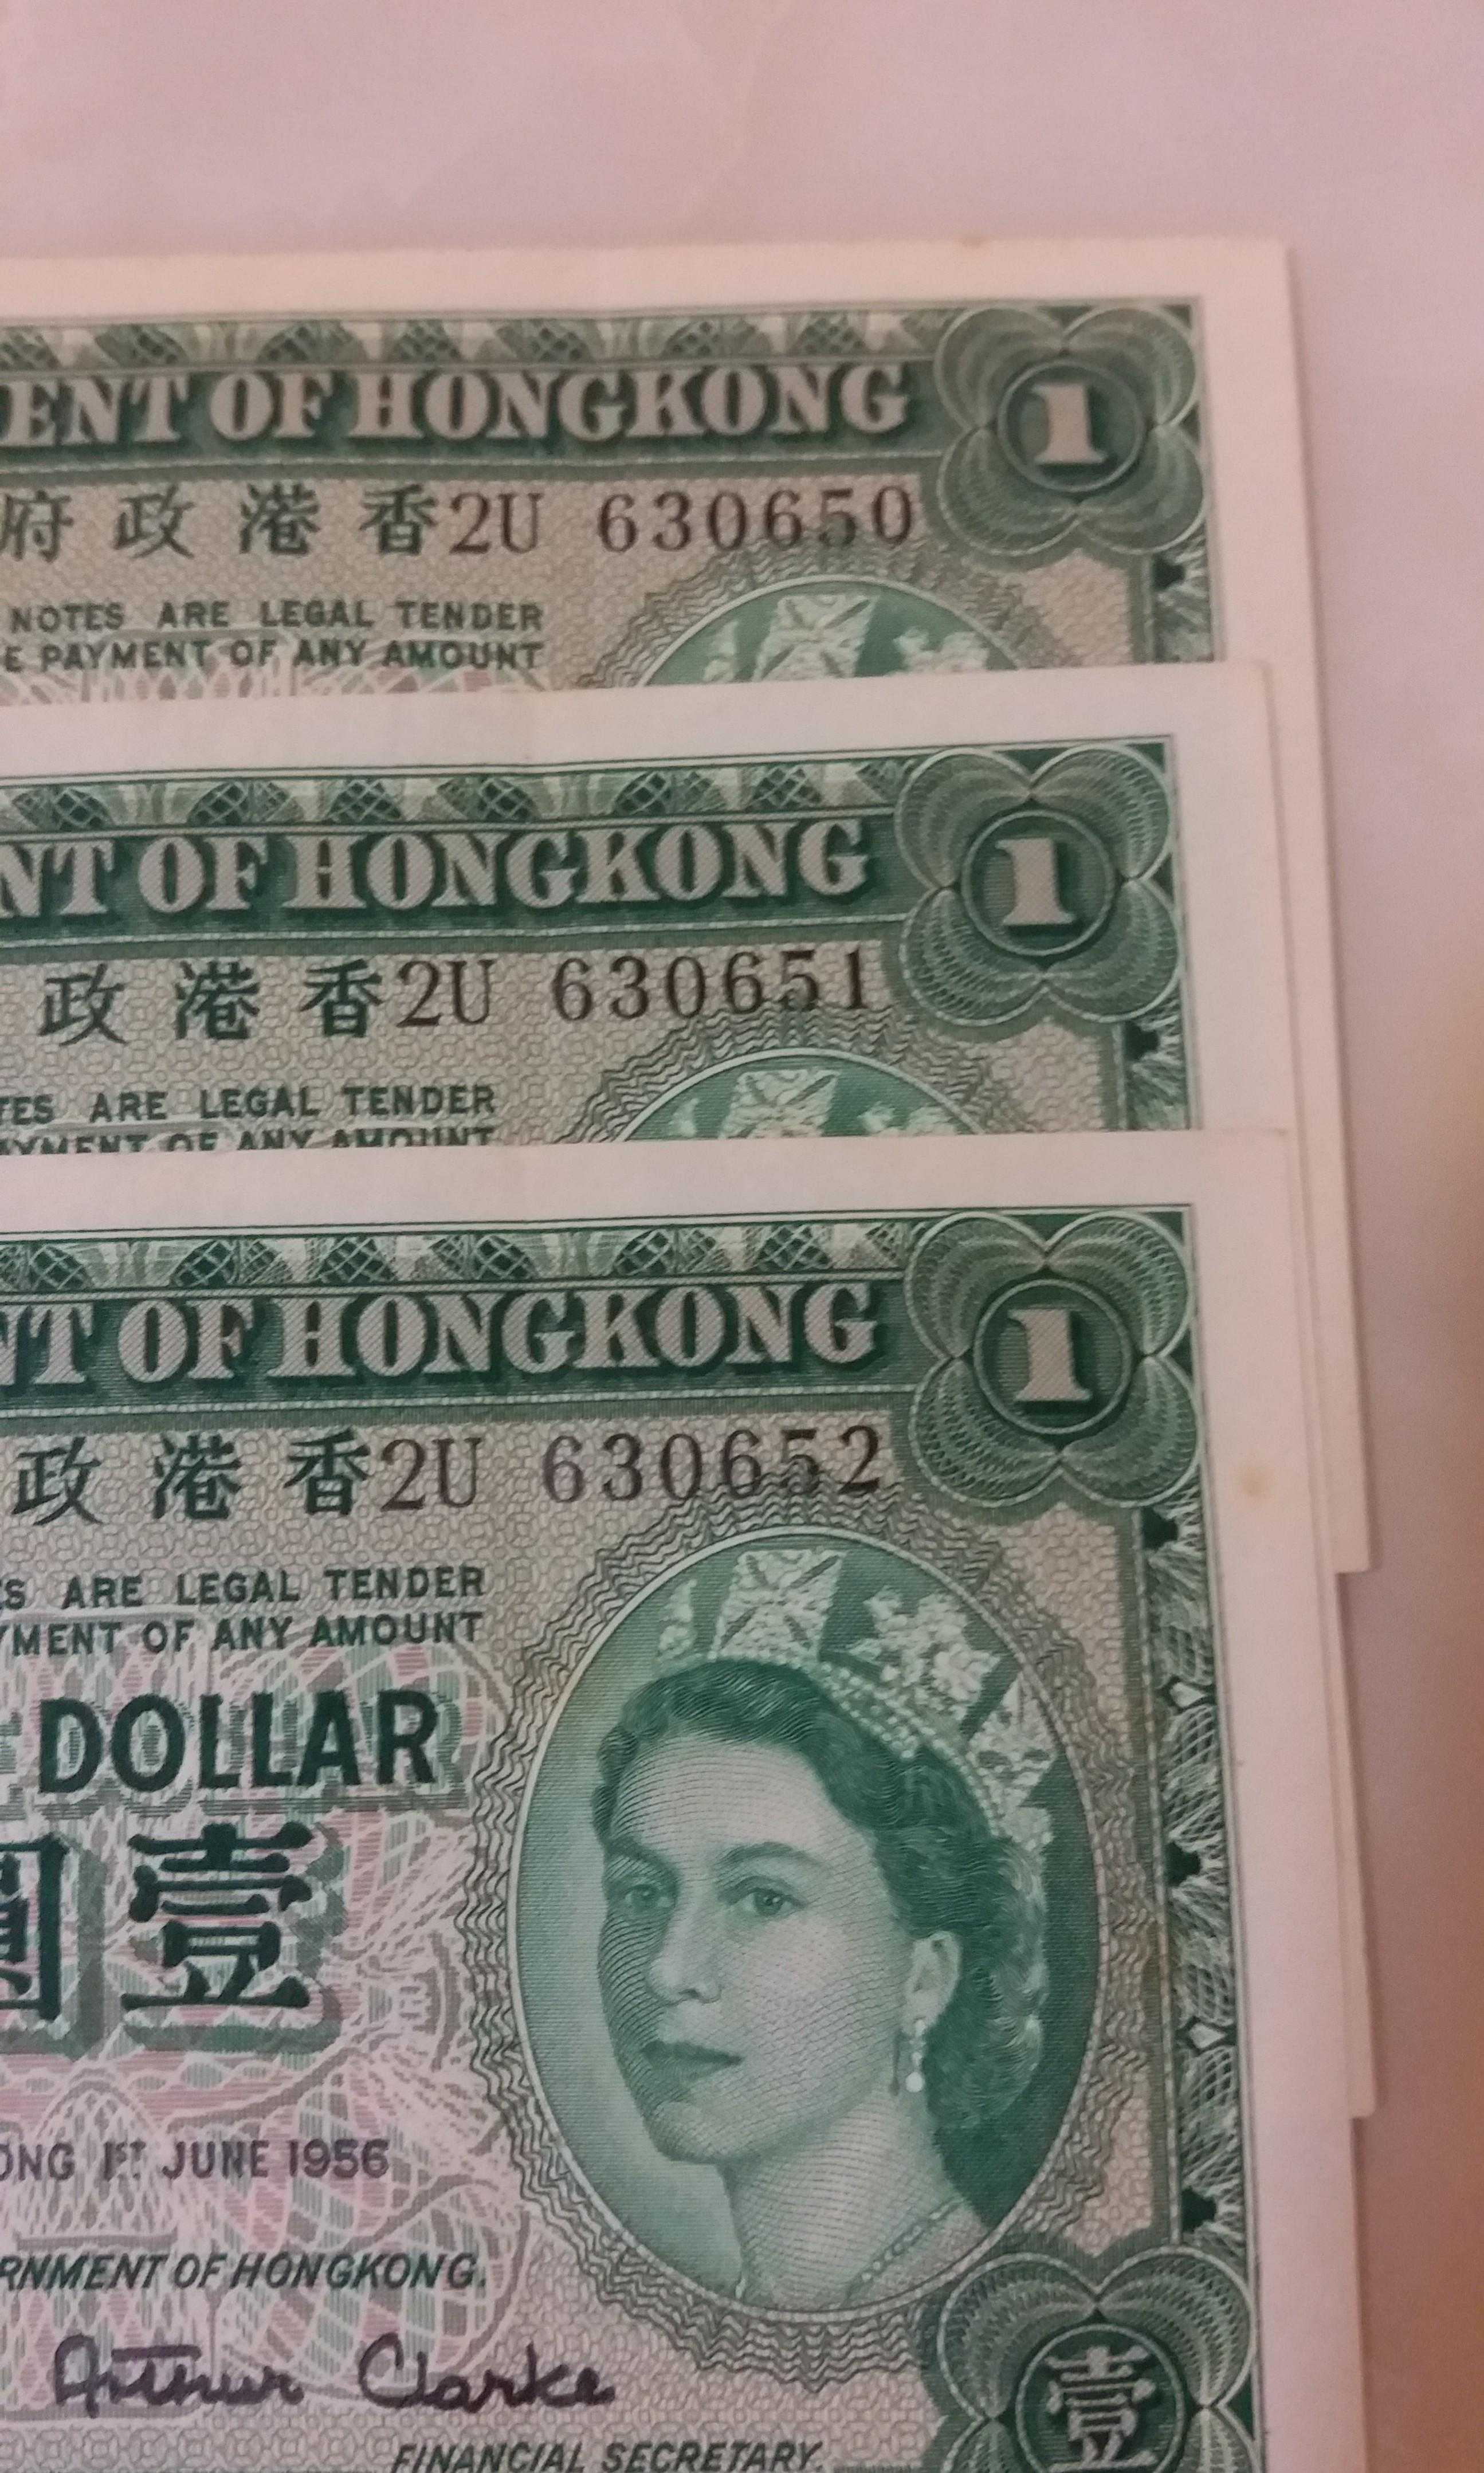 Hongkong $1  1956 (old money)